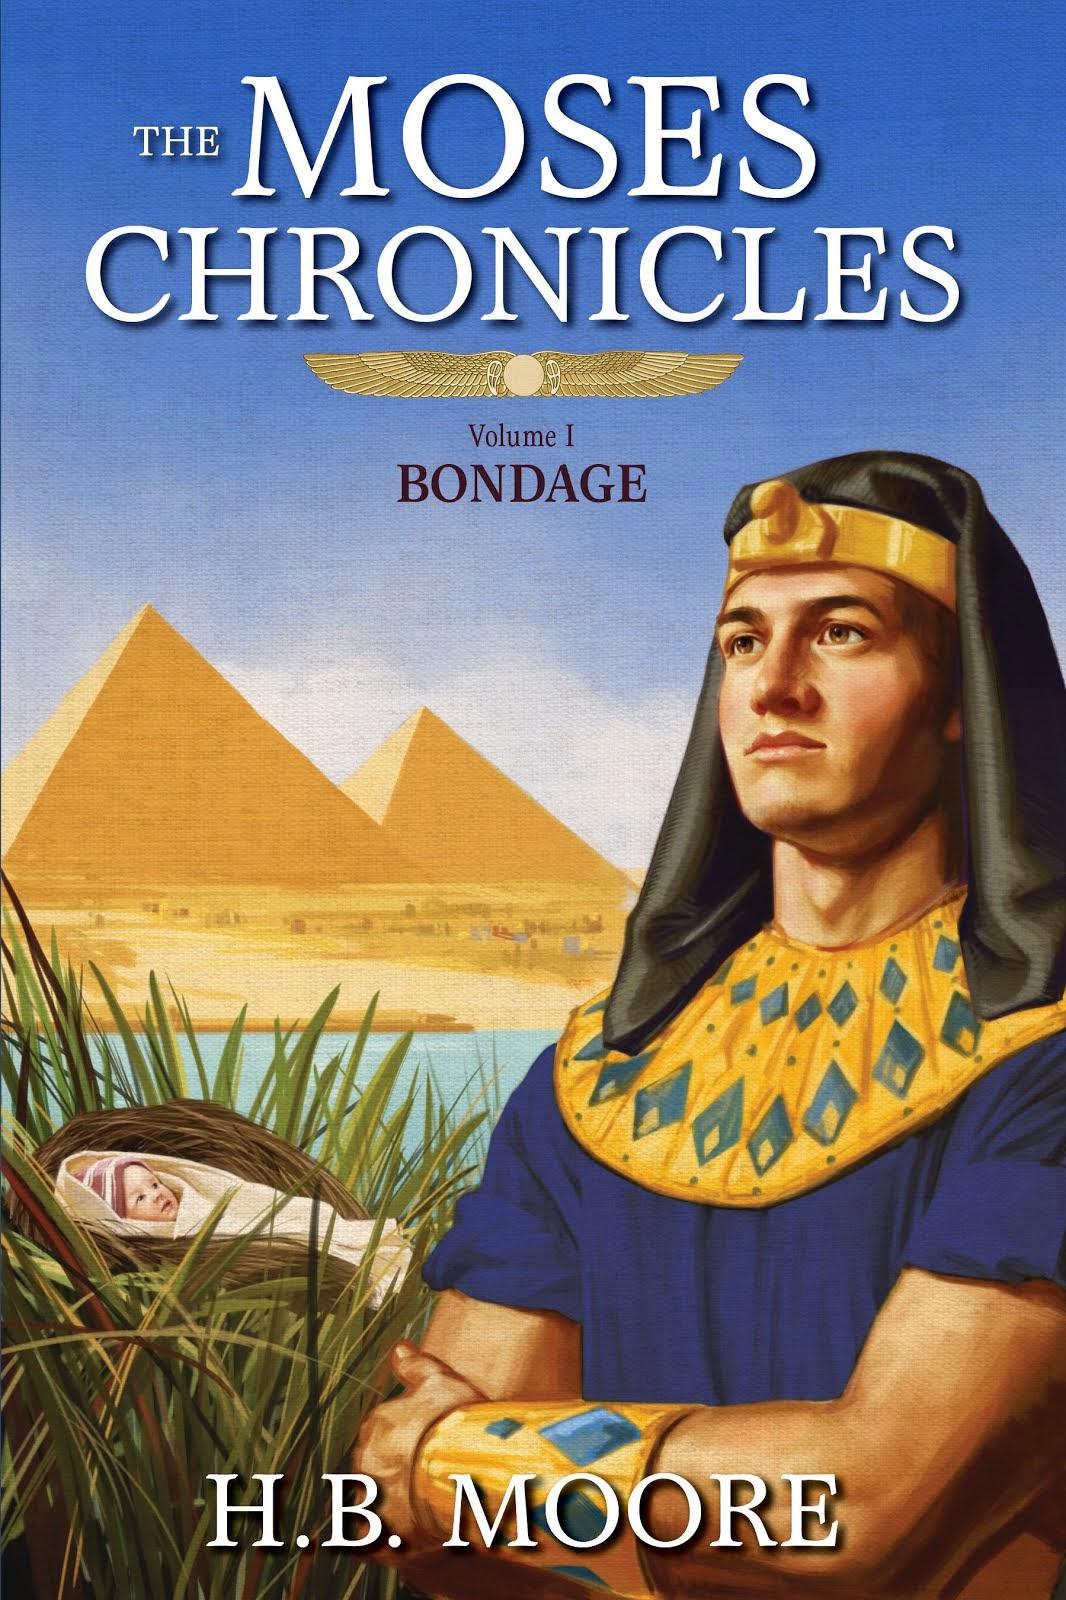 The Moses Chronicles: Bondage (book 1)